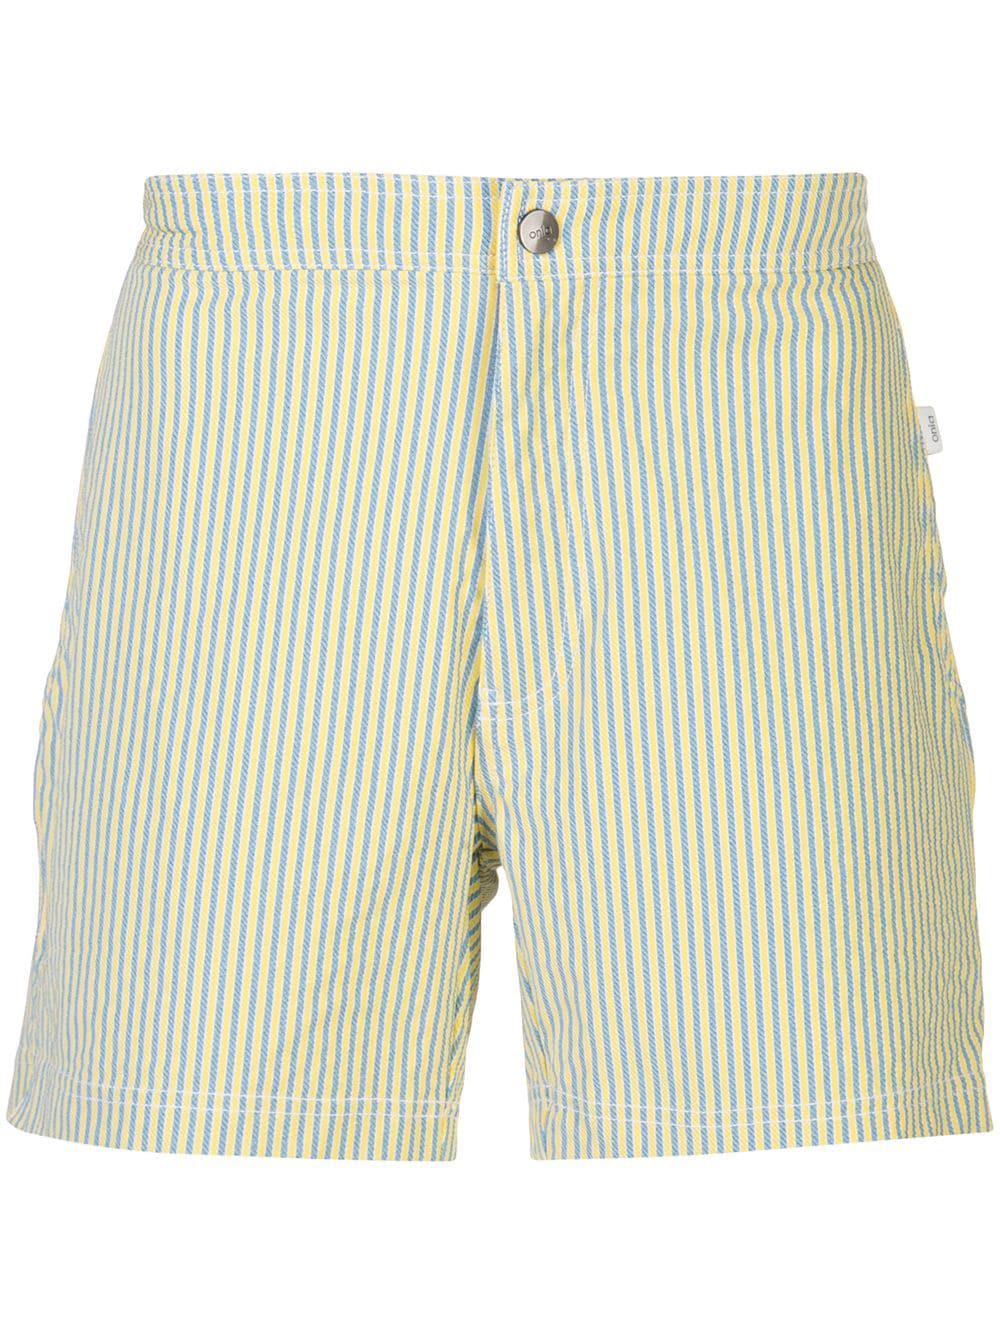 0c1389d21596 Onia Calder Stripe Swim Shorts - Yellow | ModeSens